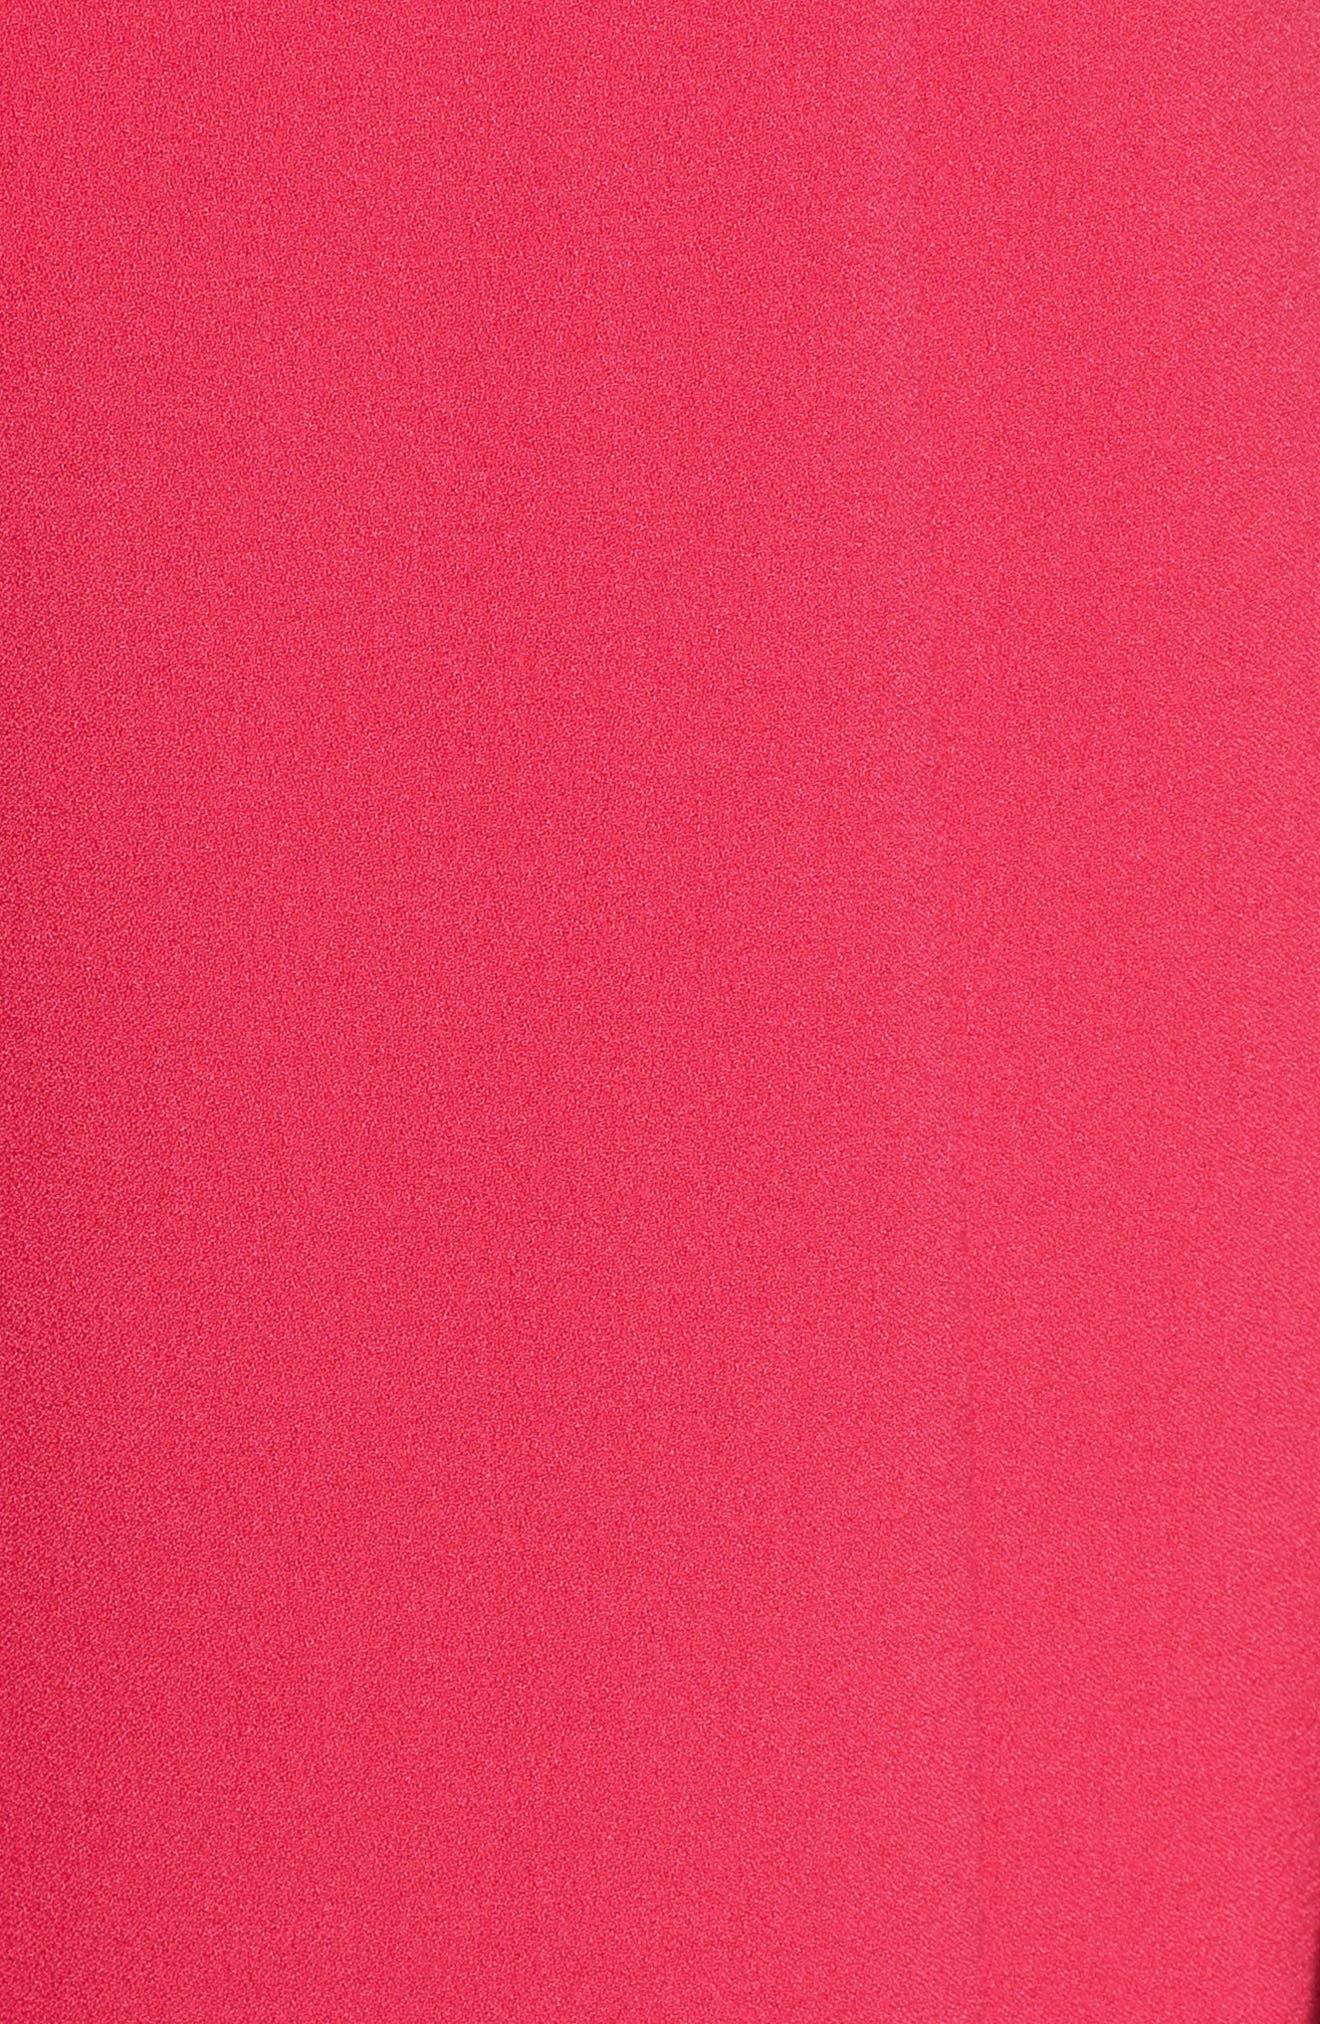 Ruffle Sheath Dress,                             Alternate thumbnail 3, color,                             Fuchsia